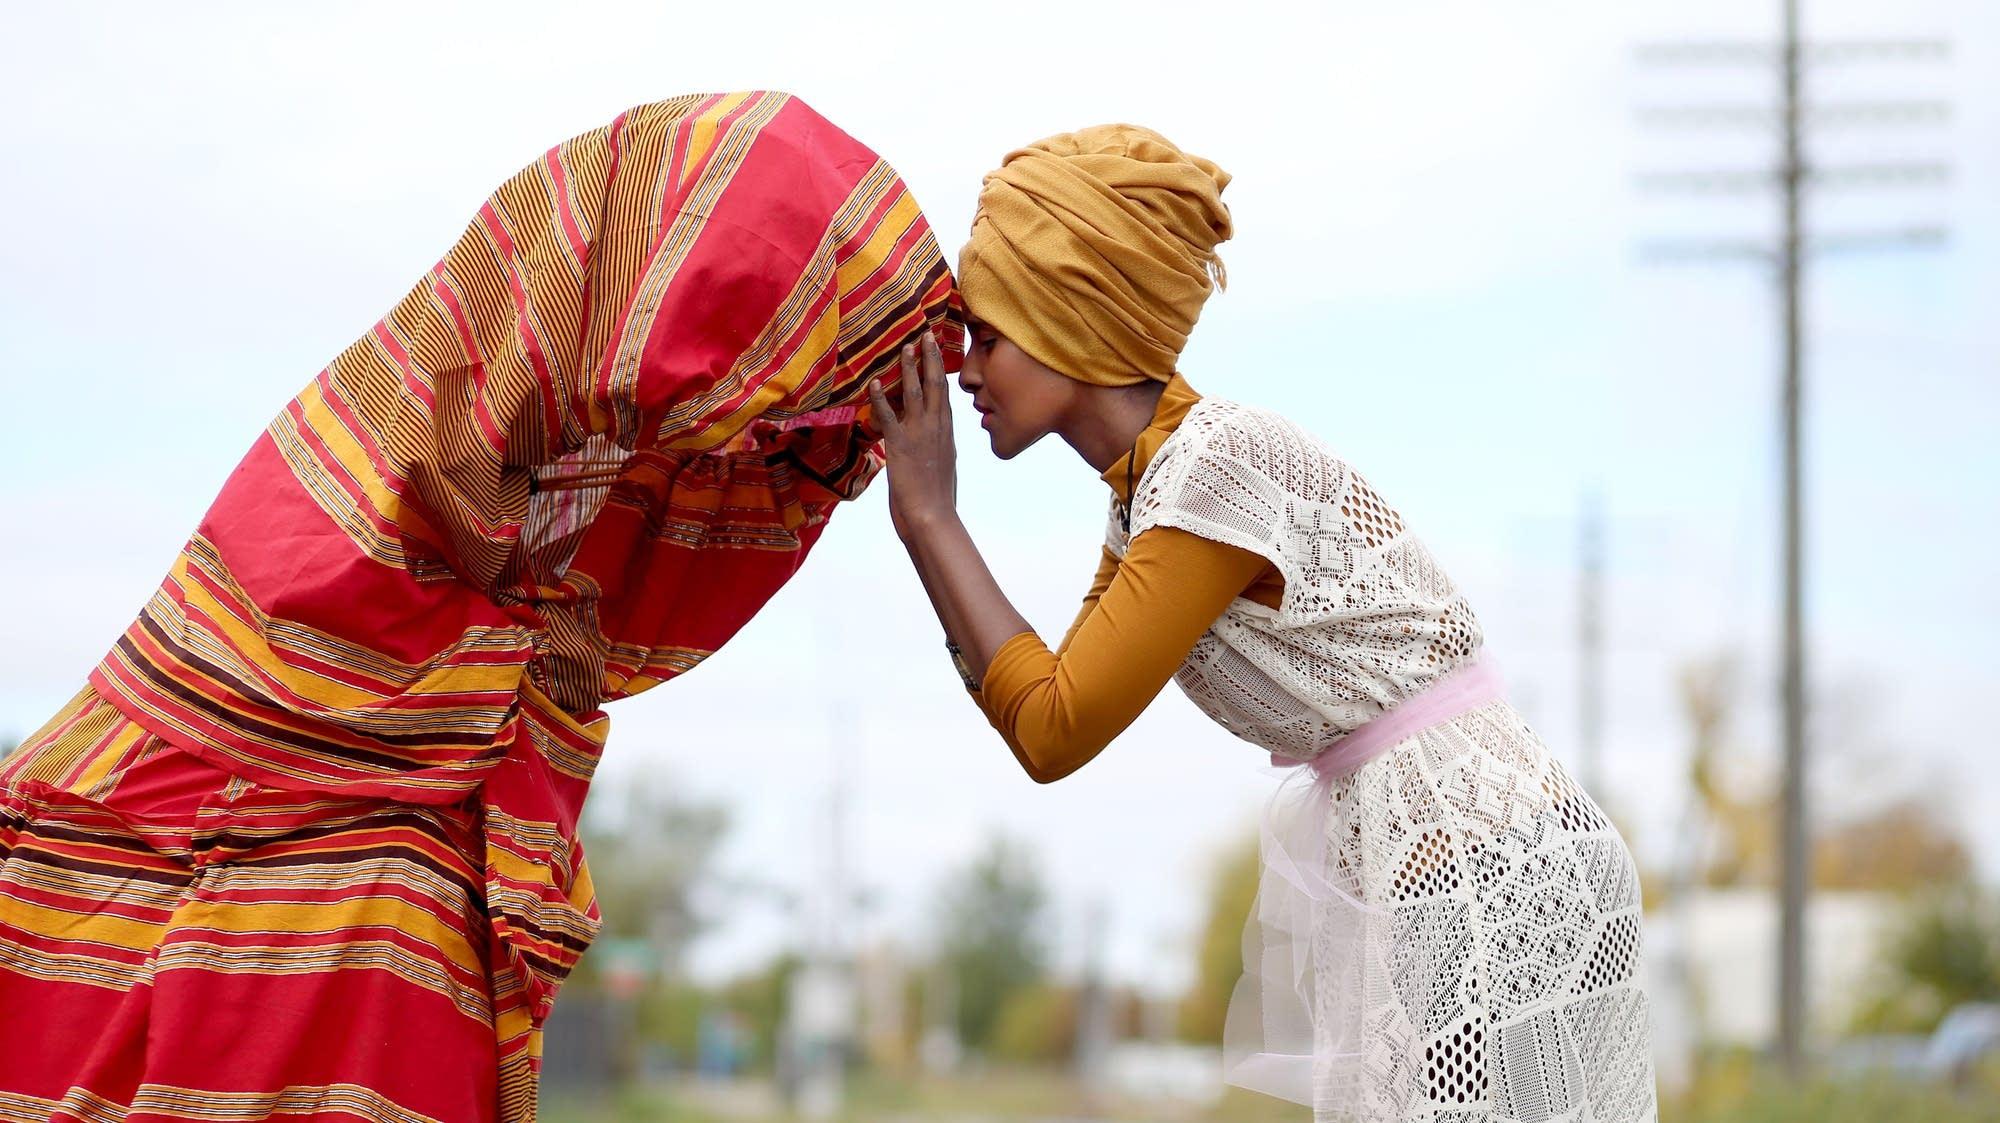 Ifrah Mansour is a Somalian refugee artist.